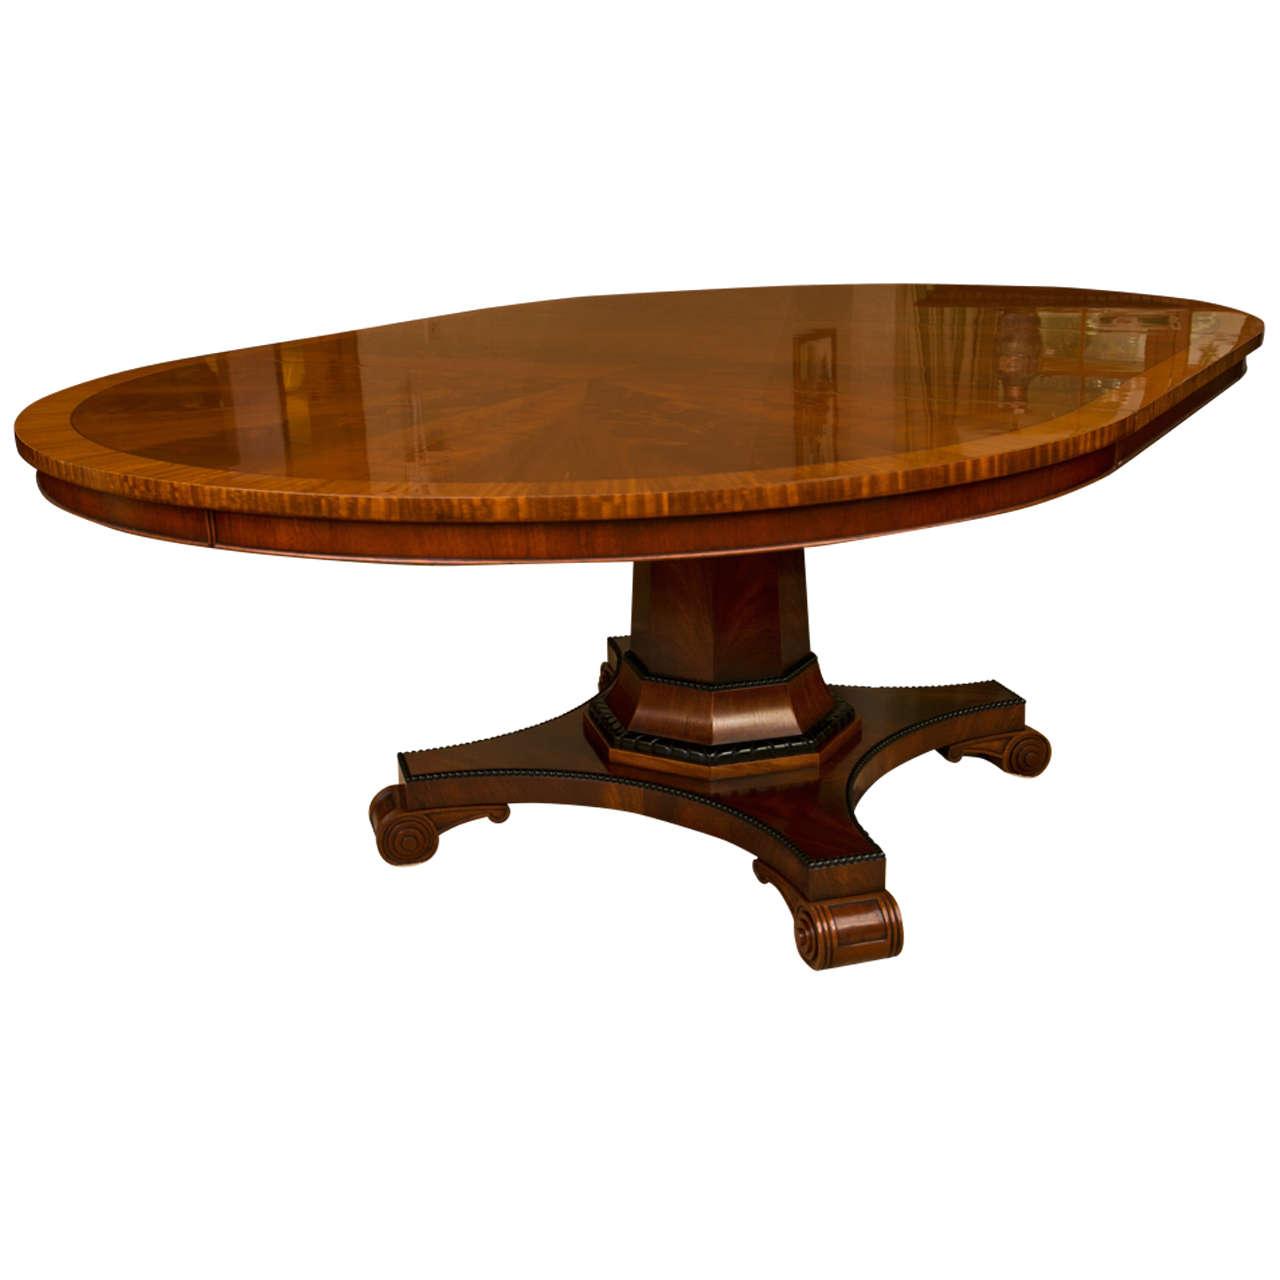 Custom Regency Style Circular Mahogany Dining Table For Sale At 1stdibs